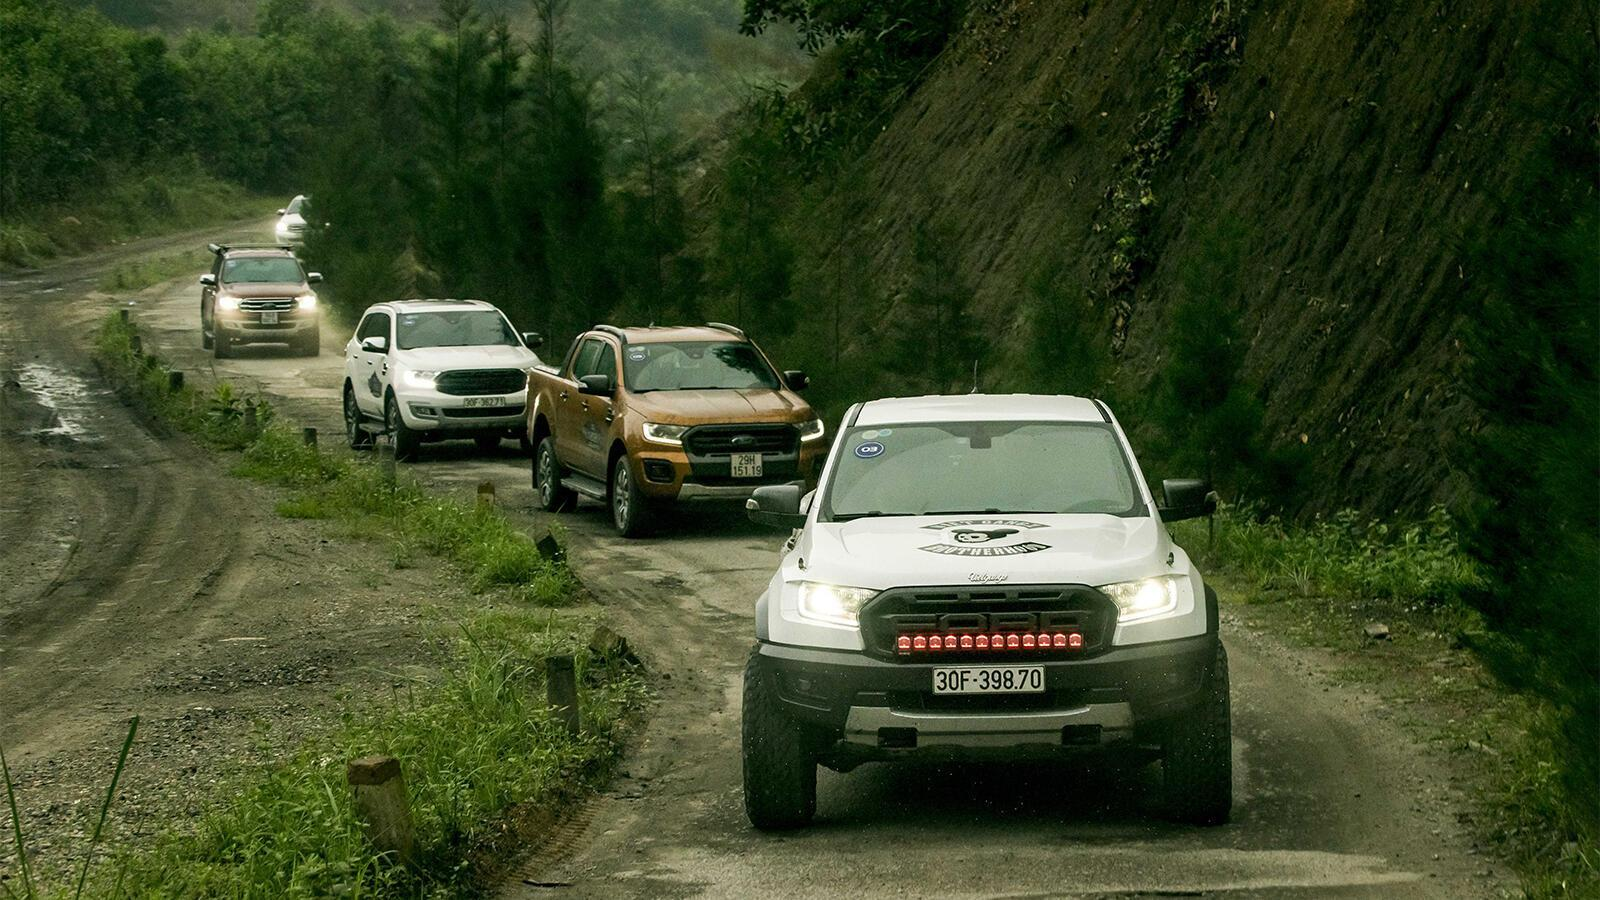 ford-extraordinary-journey-hanh-trinh-la-tren-cung-duong-quen-7.jpg